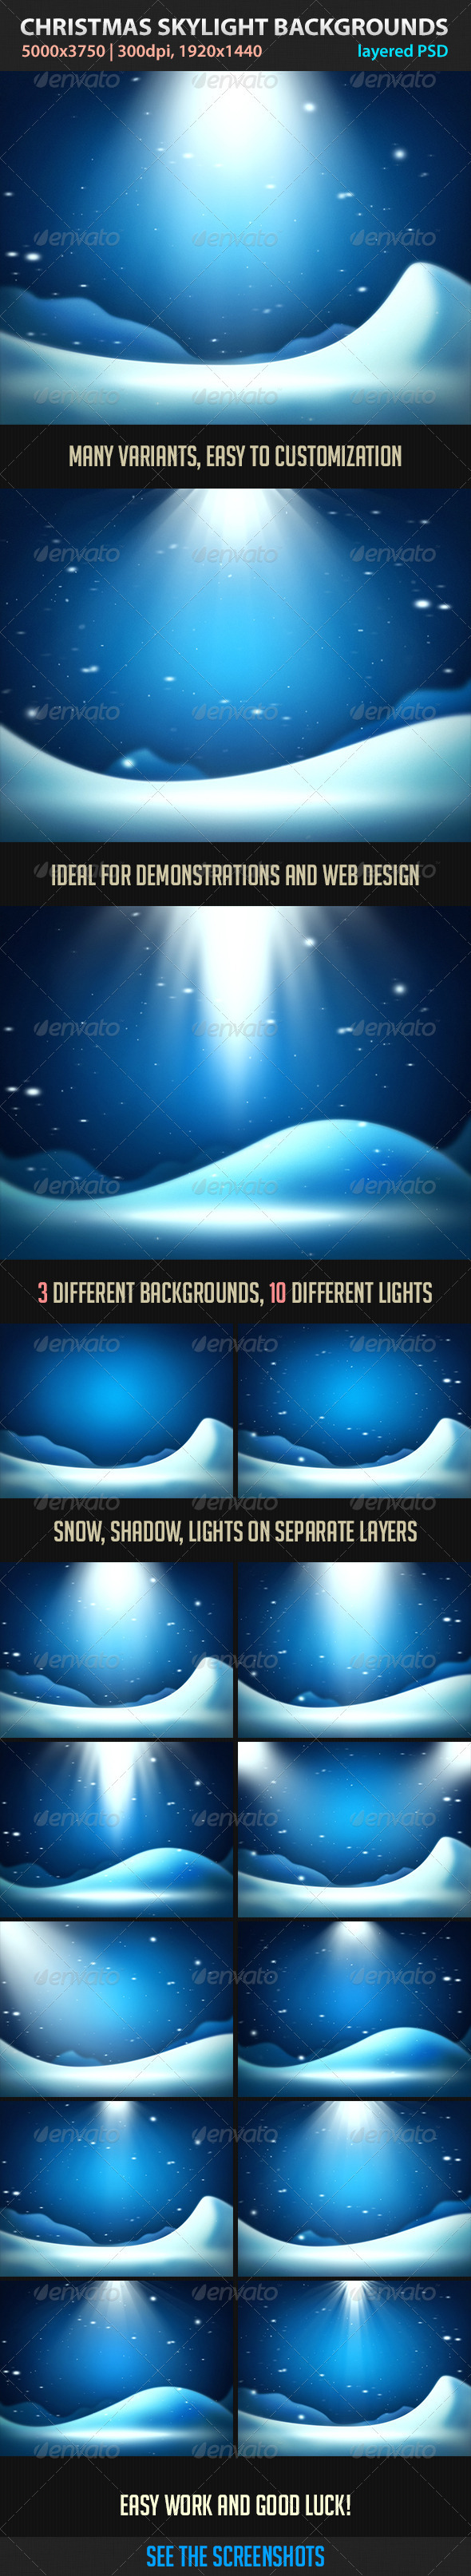 Christmas Skylight Backgrounds - Nature Backgrounds